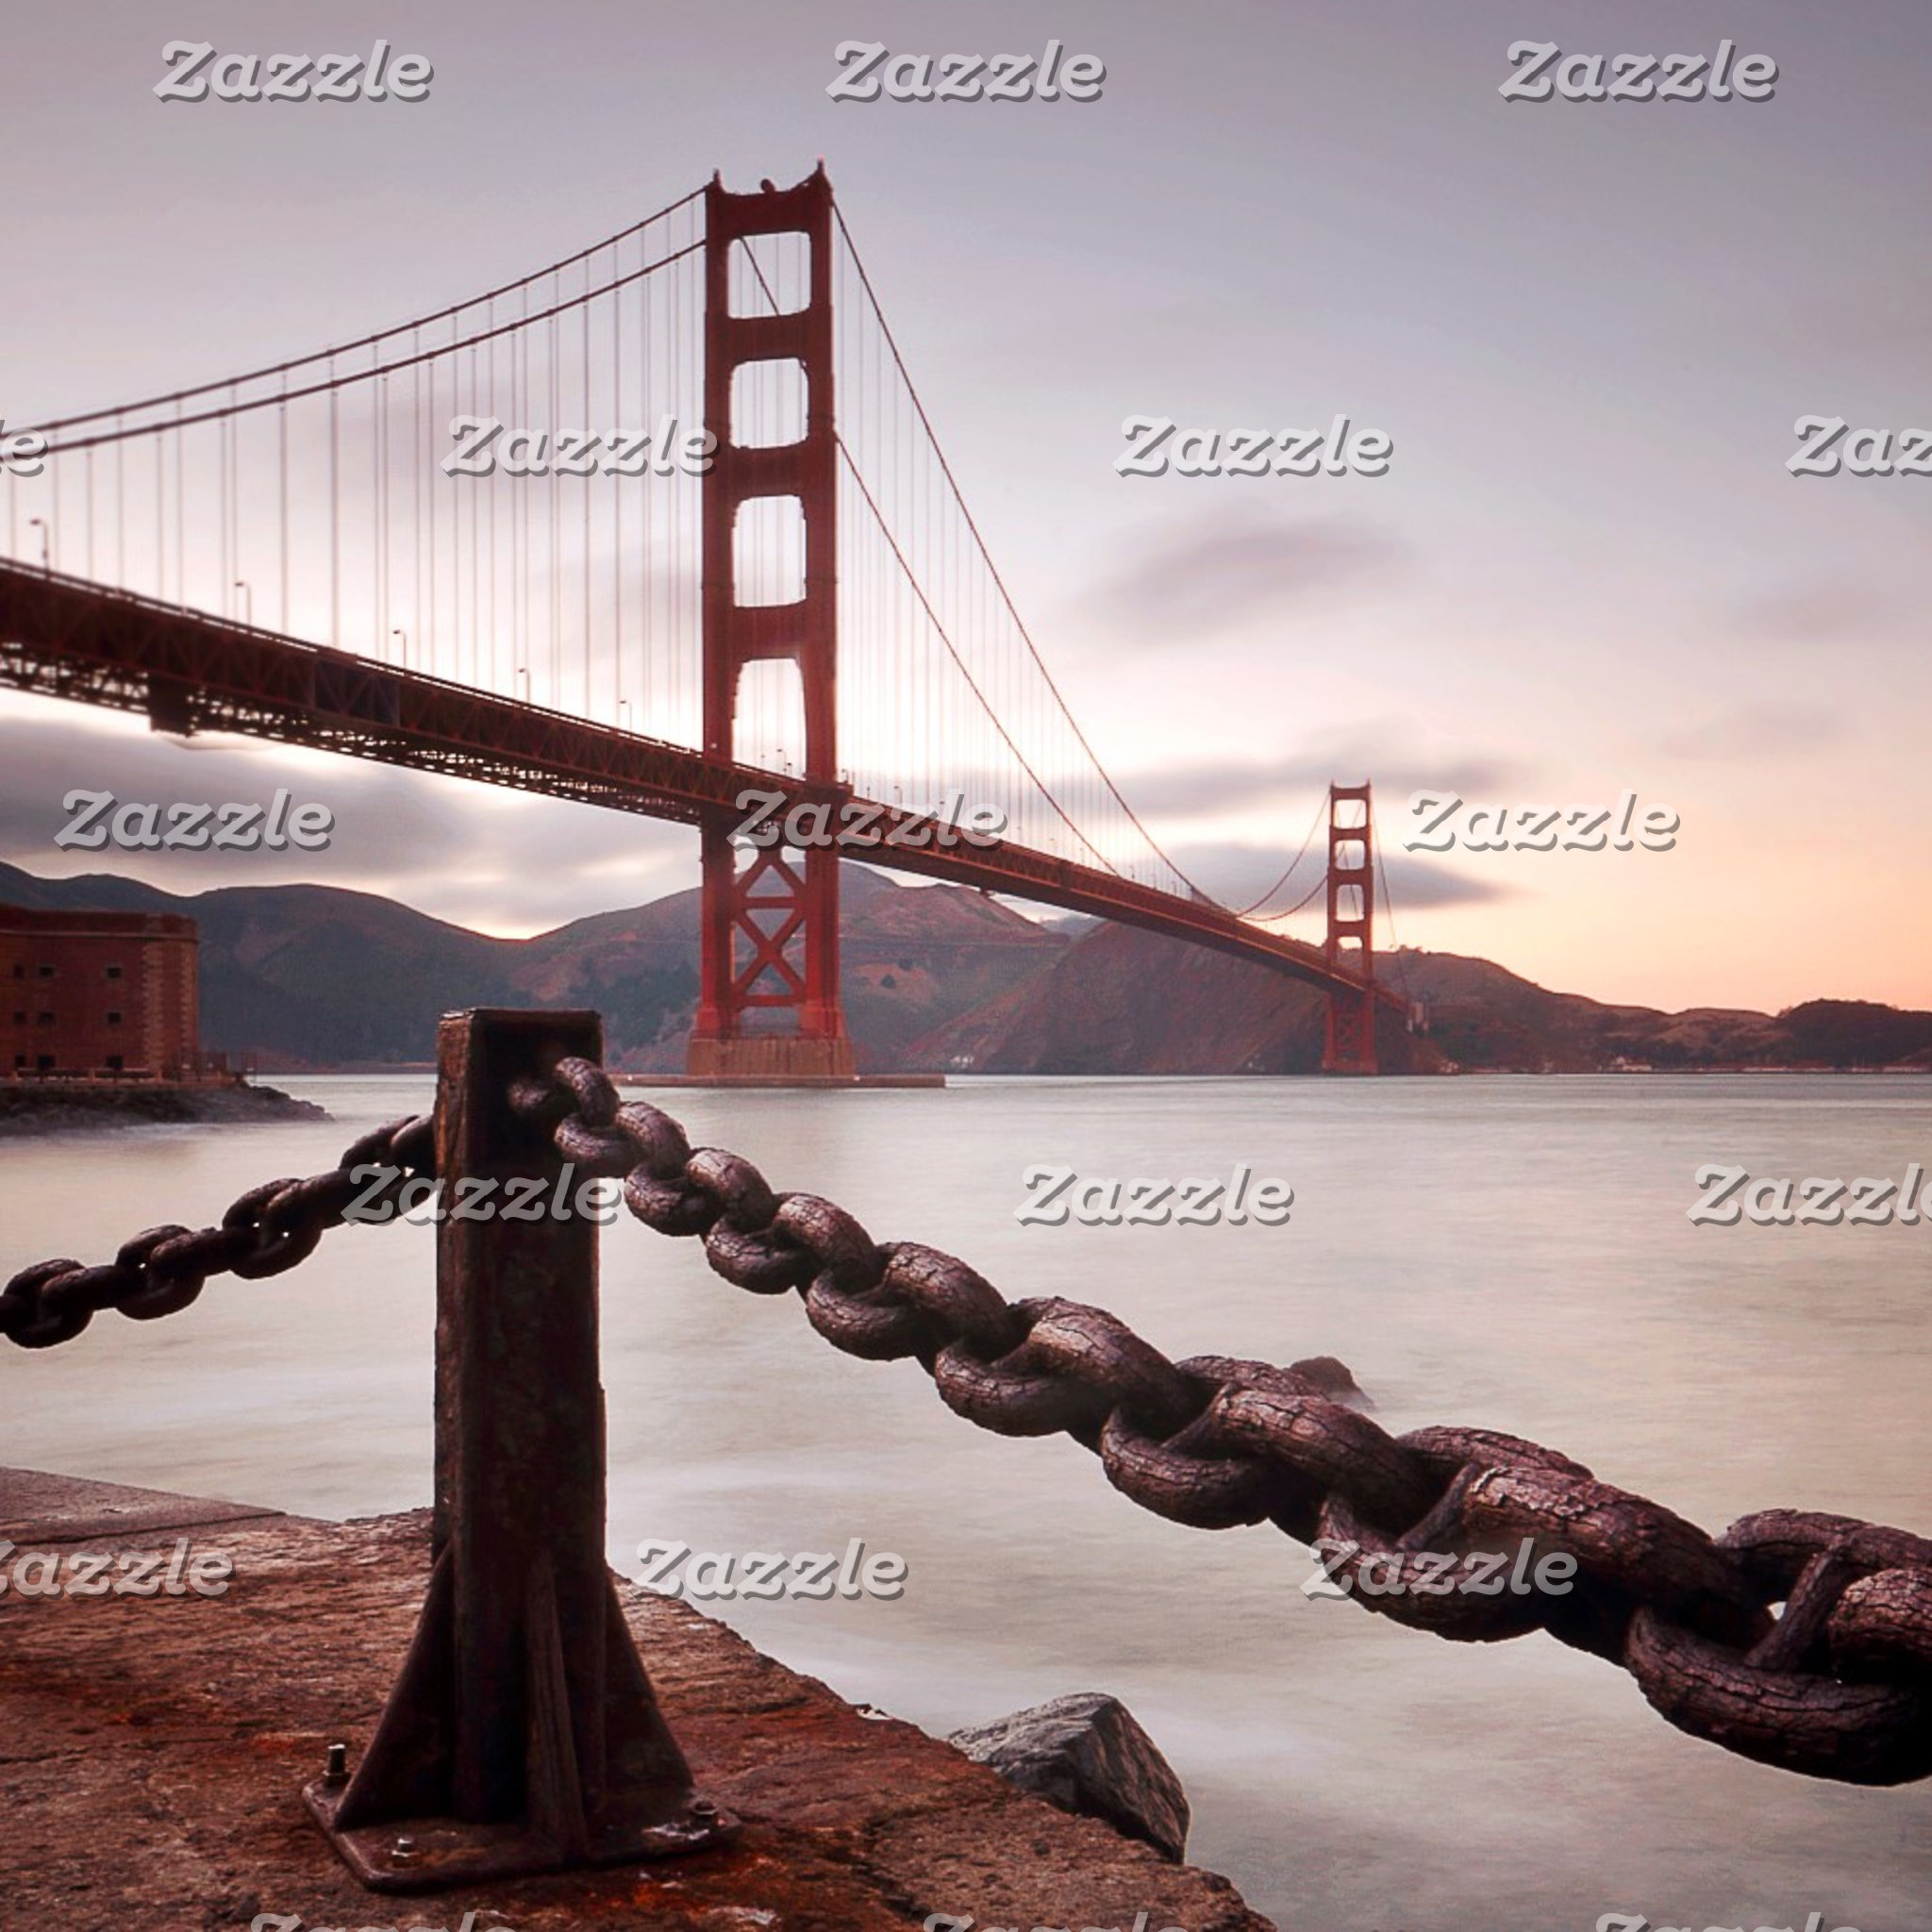 Golden Gate Bridge against mountains